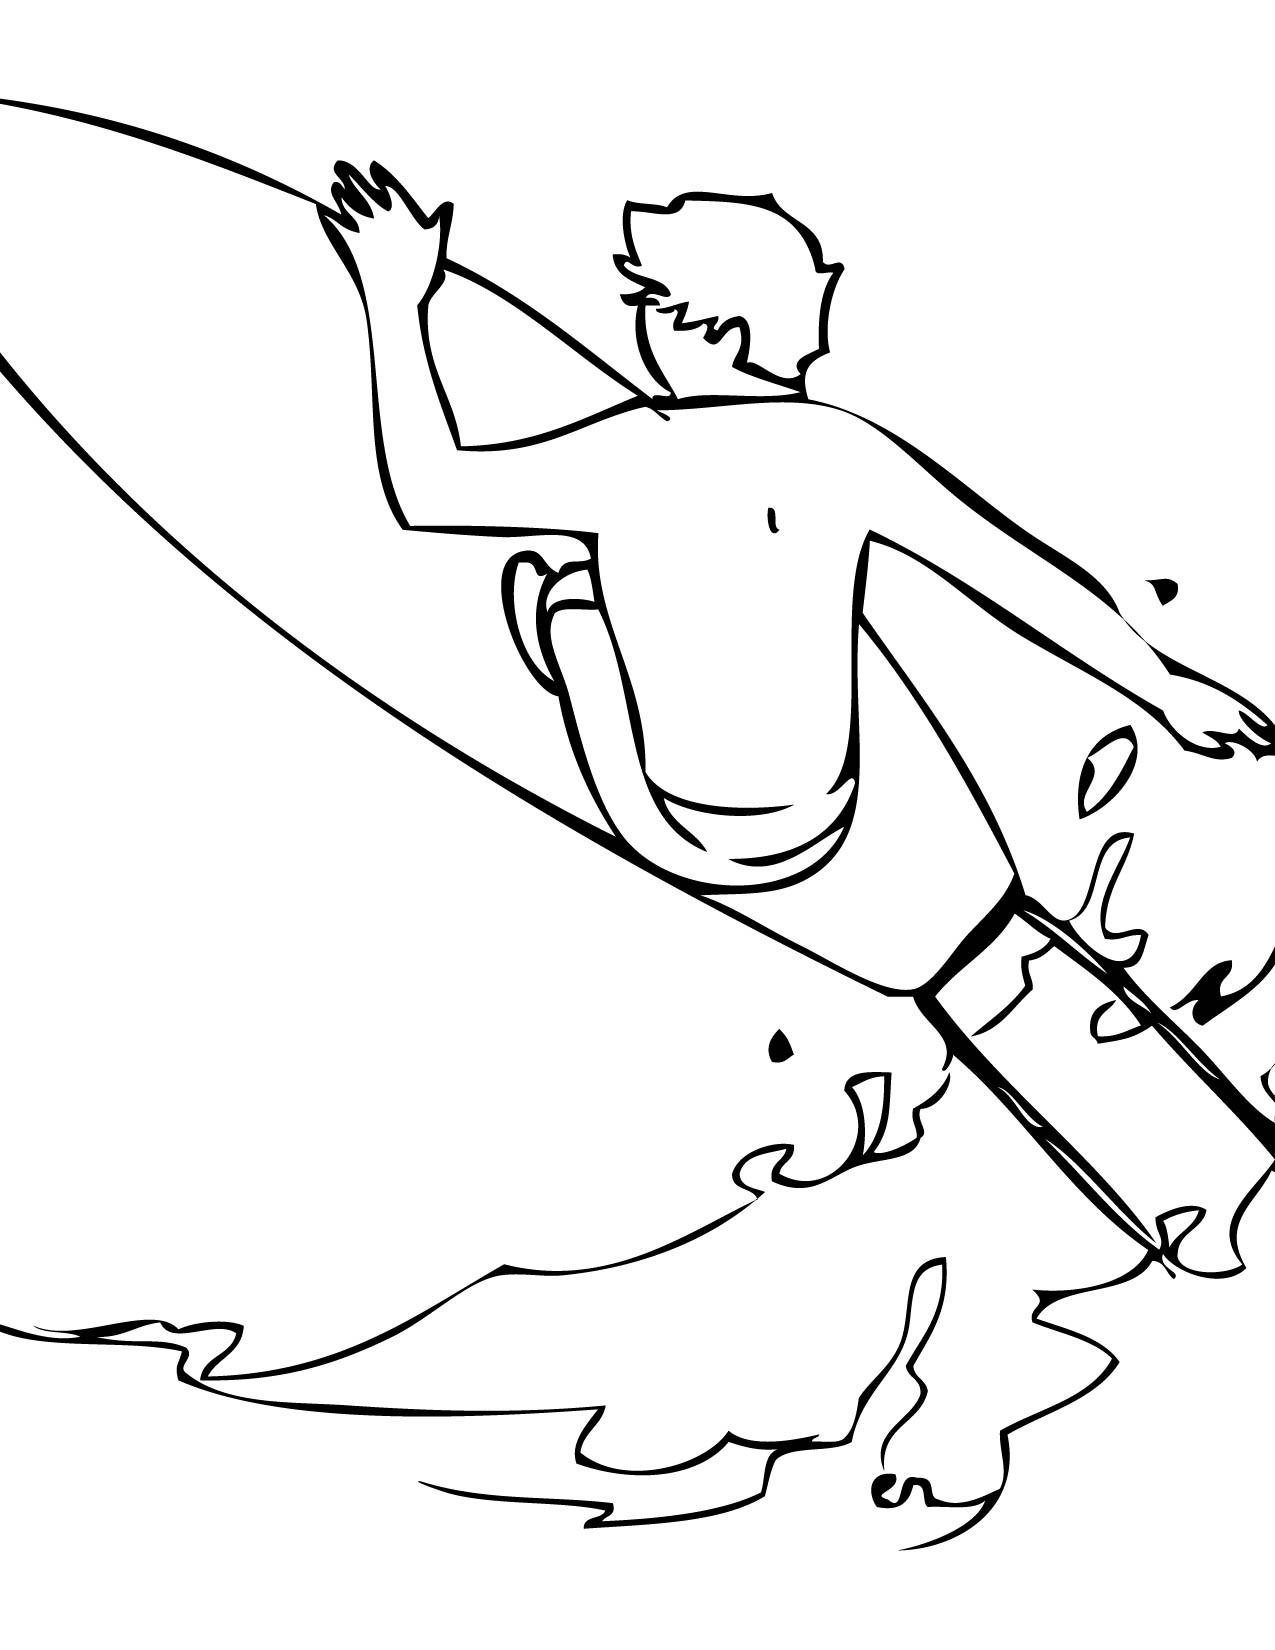 Surfer coloring #10, Download drawings